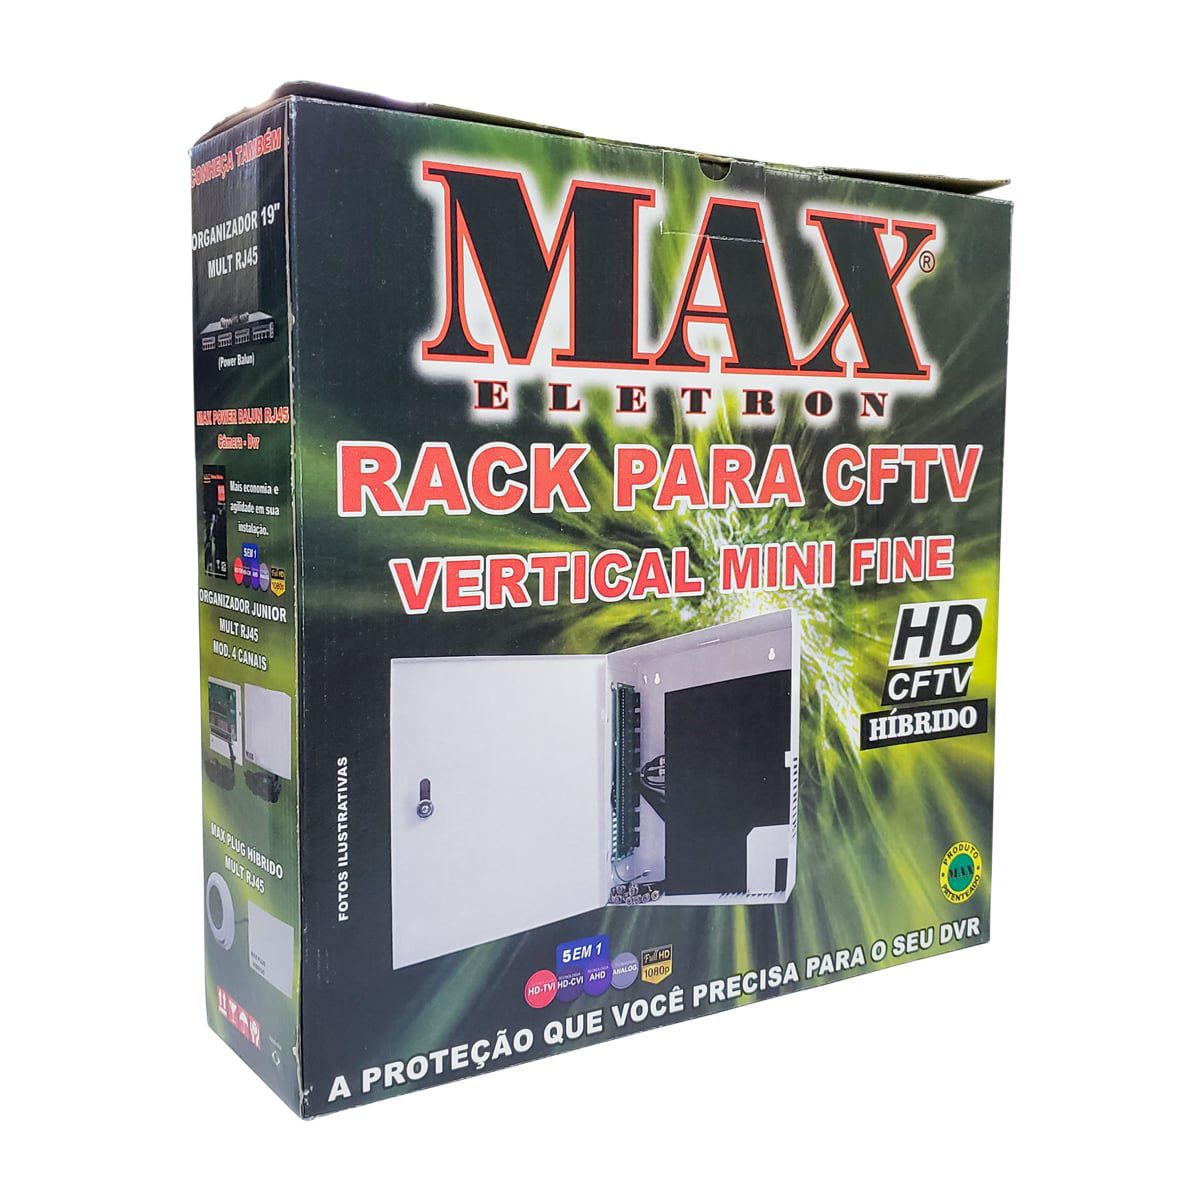 Rack Vertical Fine c/ Placa Eletrônica 16 Canais Max Eletron  - CFTV Clube | Brasil